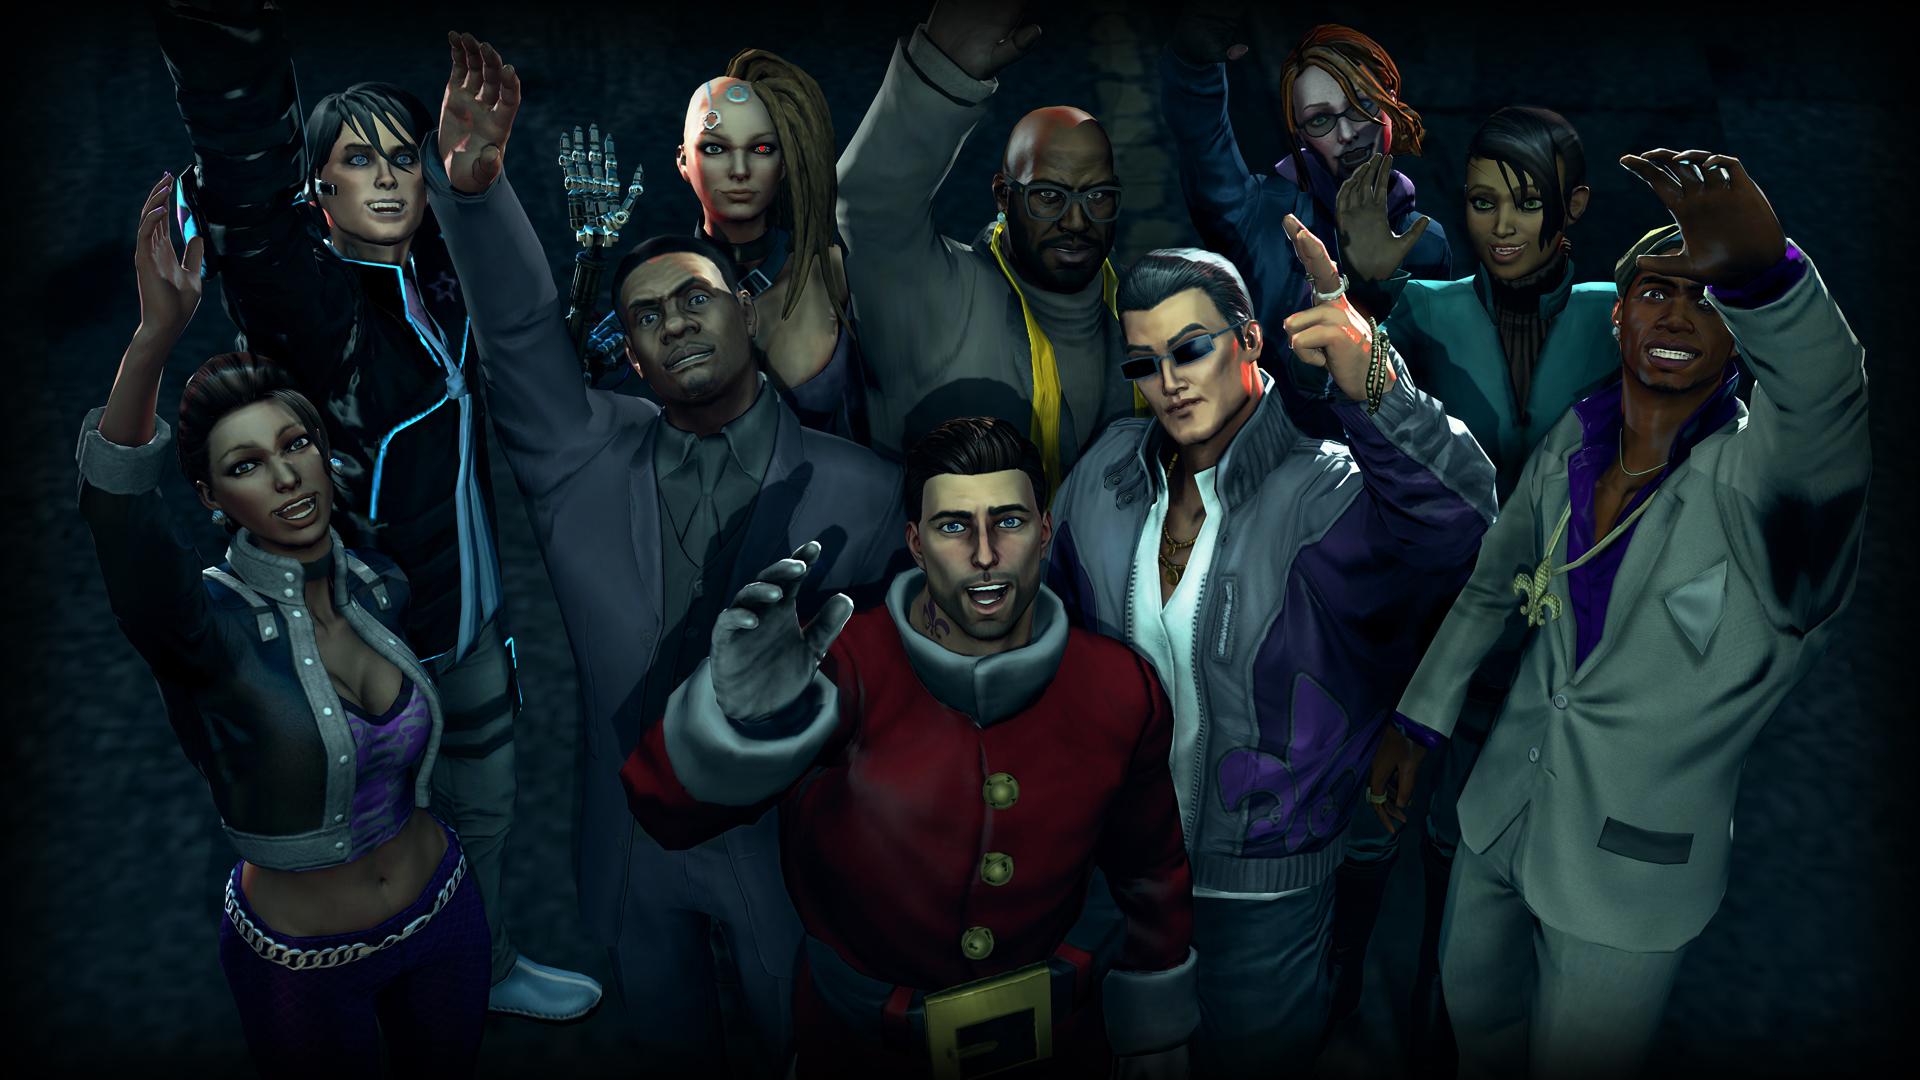 Saints Row 4 Christmas DLC Coming December 11th